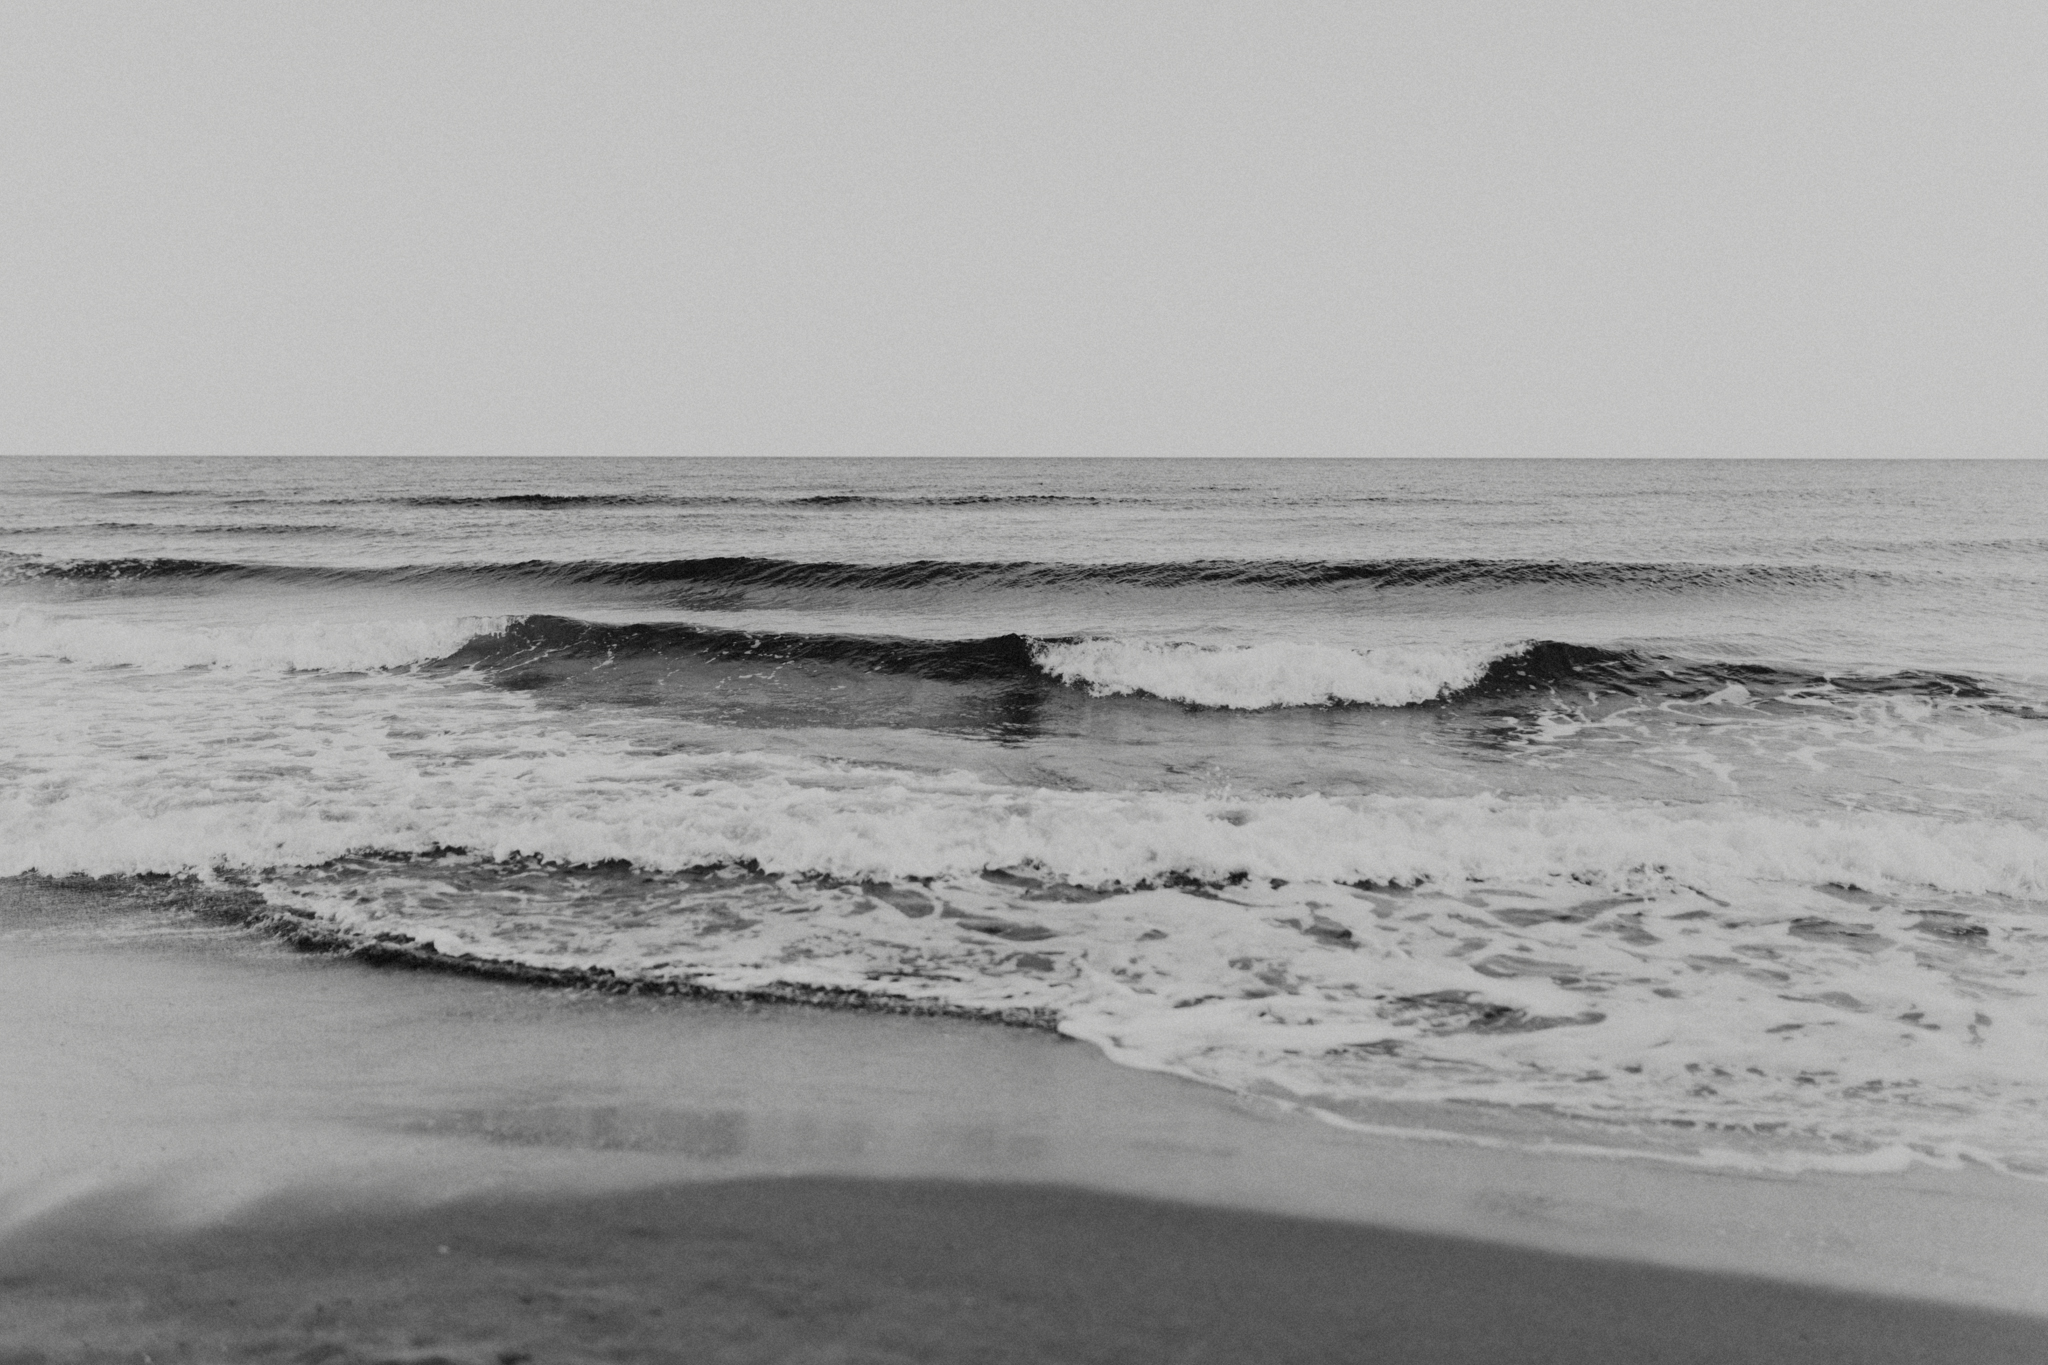 spain_beach_engagement-3.jpg